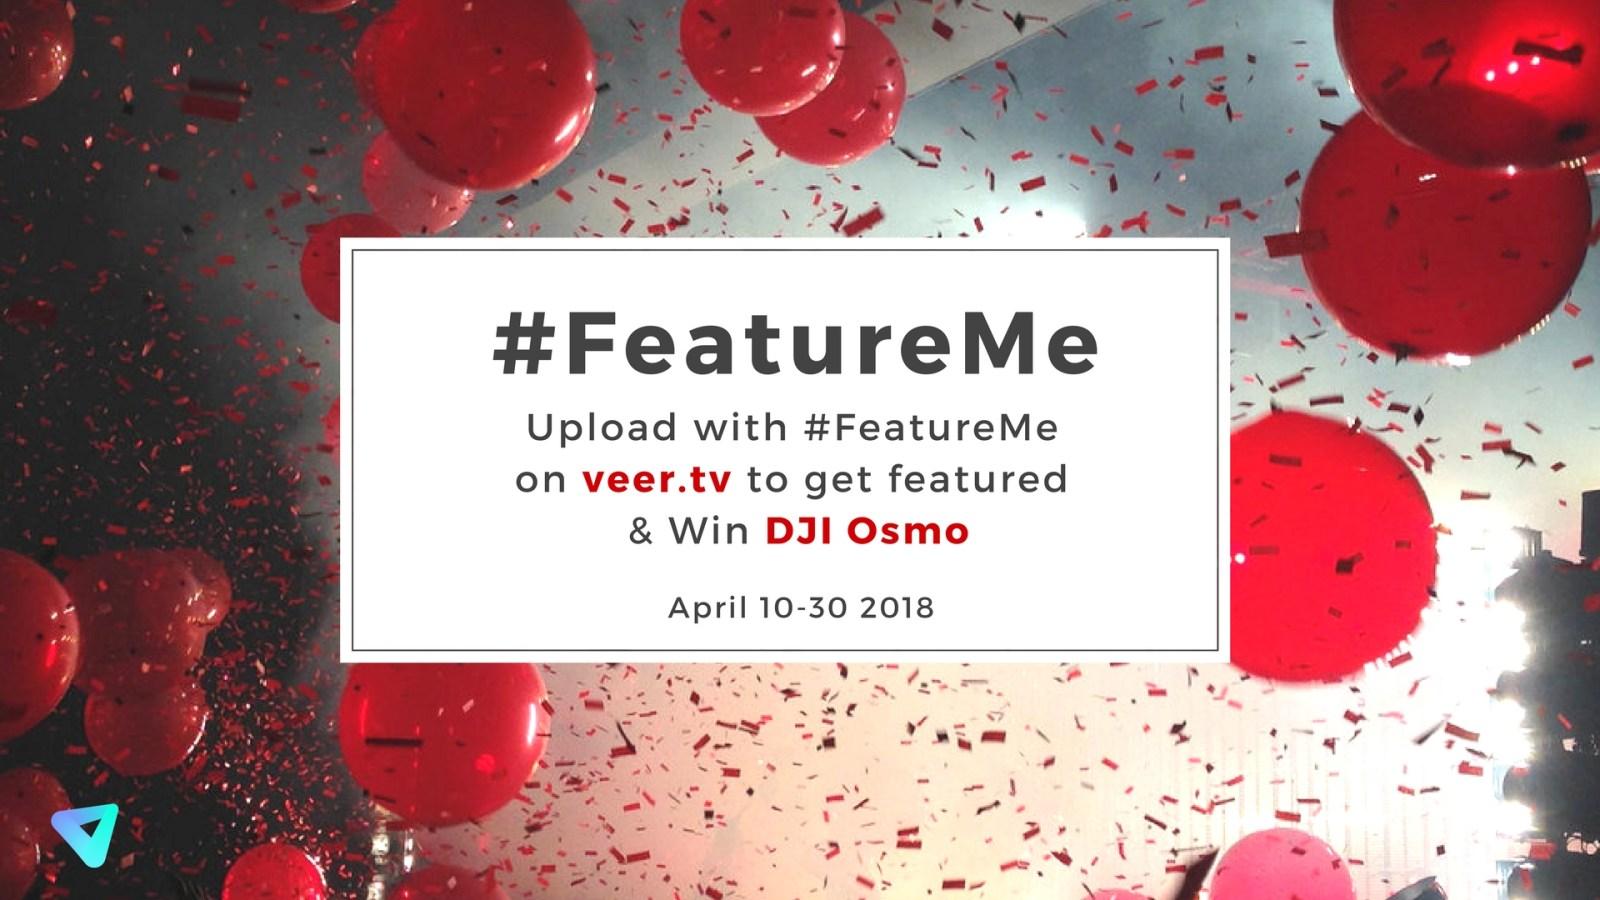 Get Featured plus Win DJI Osmo? Hashtag #FeatureMe!